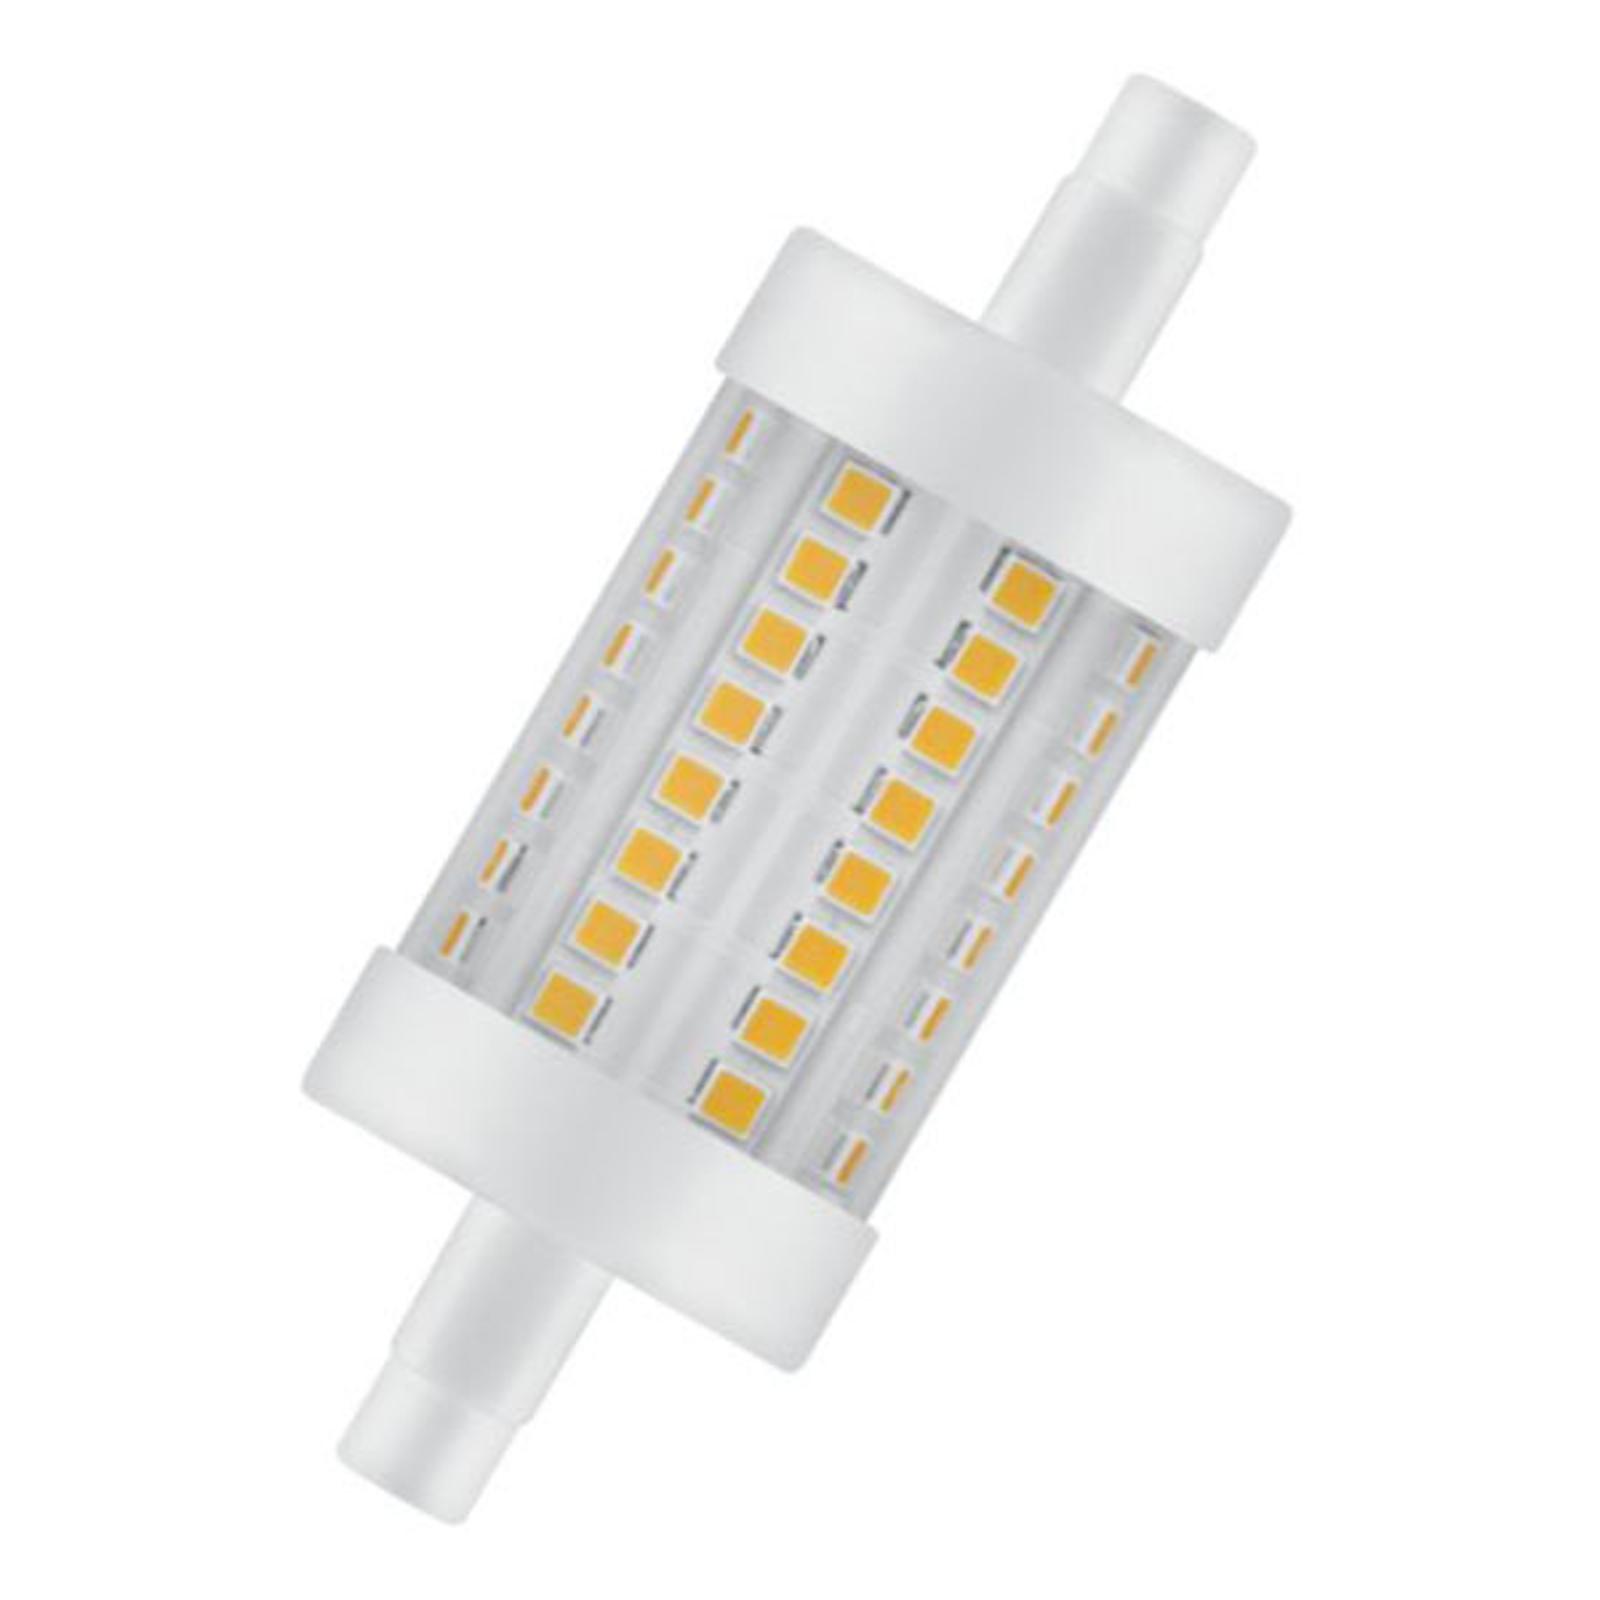 OSRAM LED-Lampe R7s 7W 2.700K